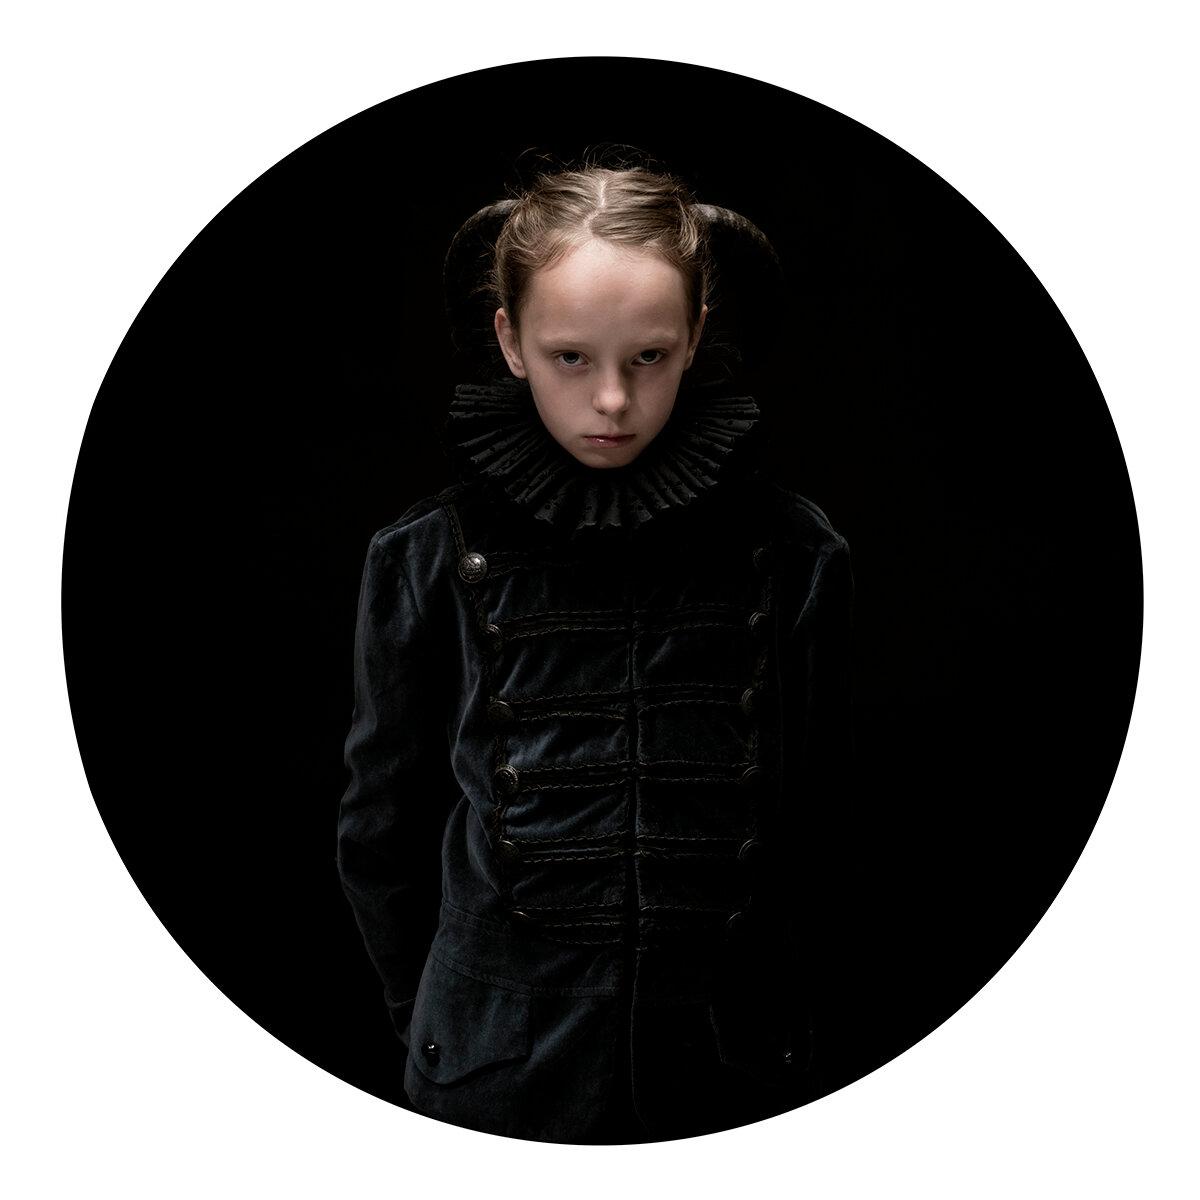 Childhood-Lost_07.jpg